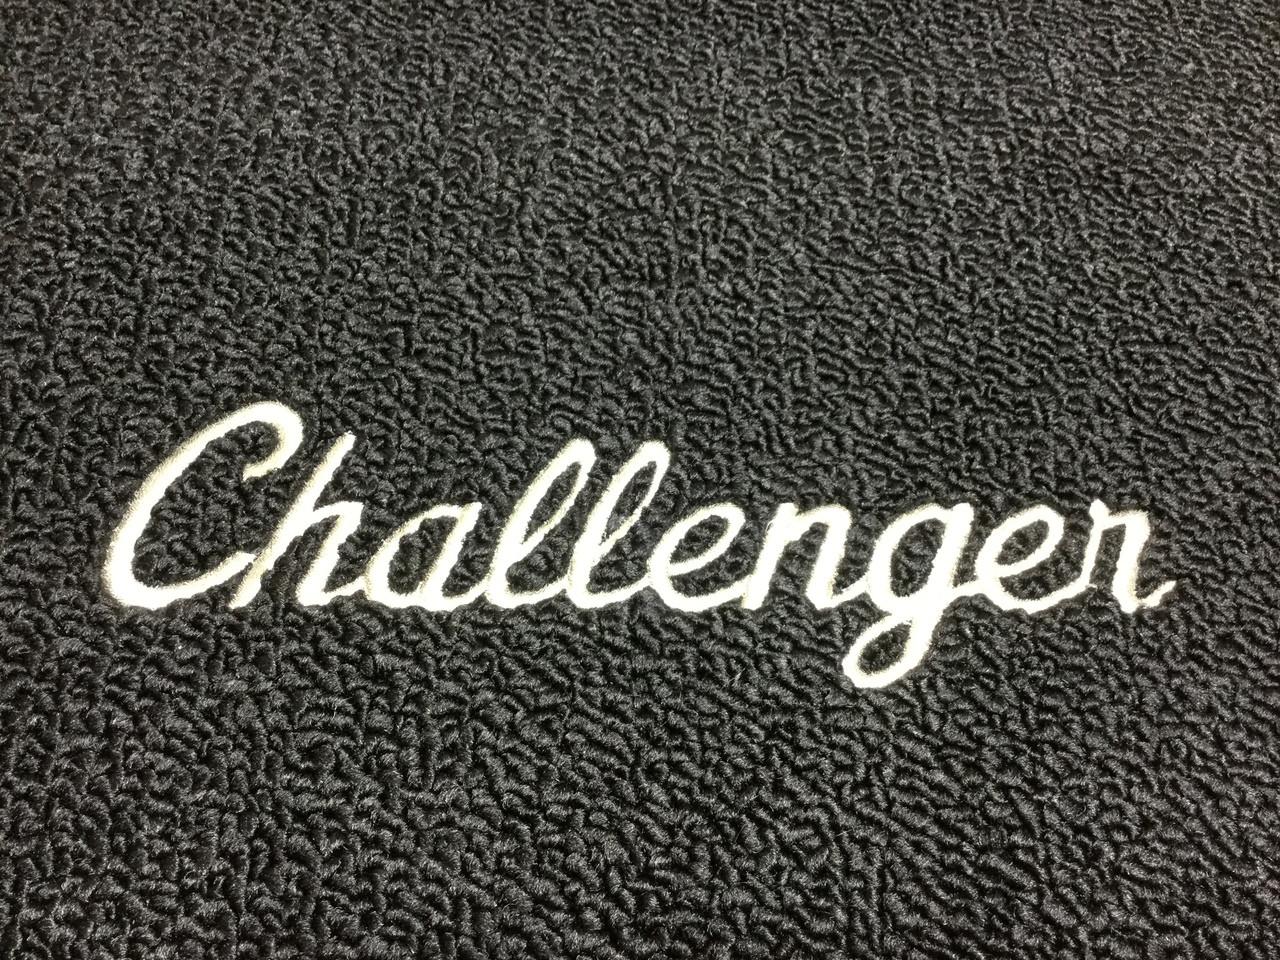 Mopar 70 71 72 73 74 Challenger Package Tray Jute 1970 1971 1972 1973 1974 NEW